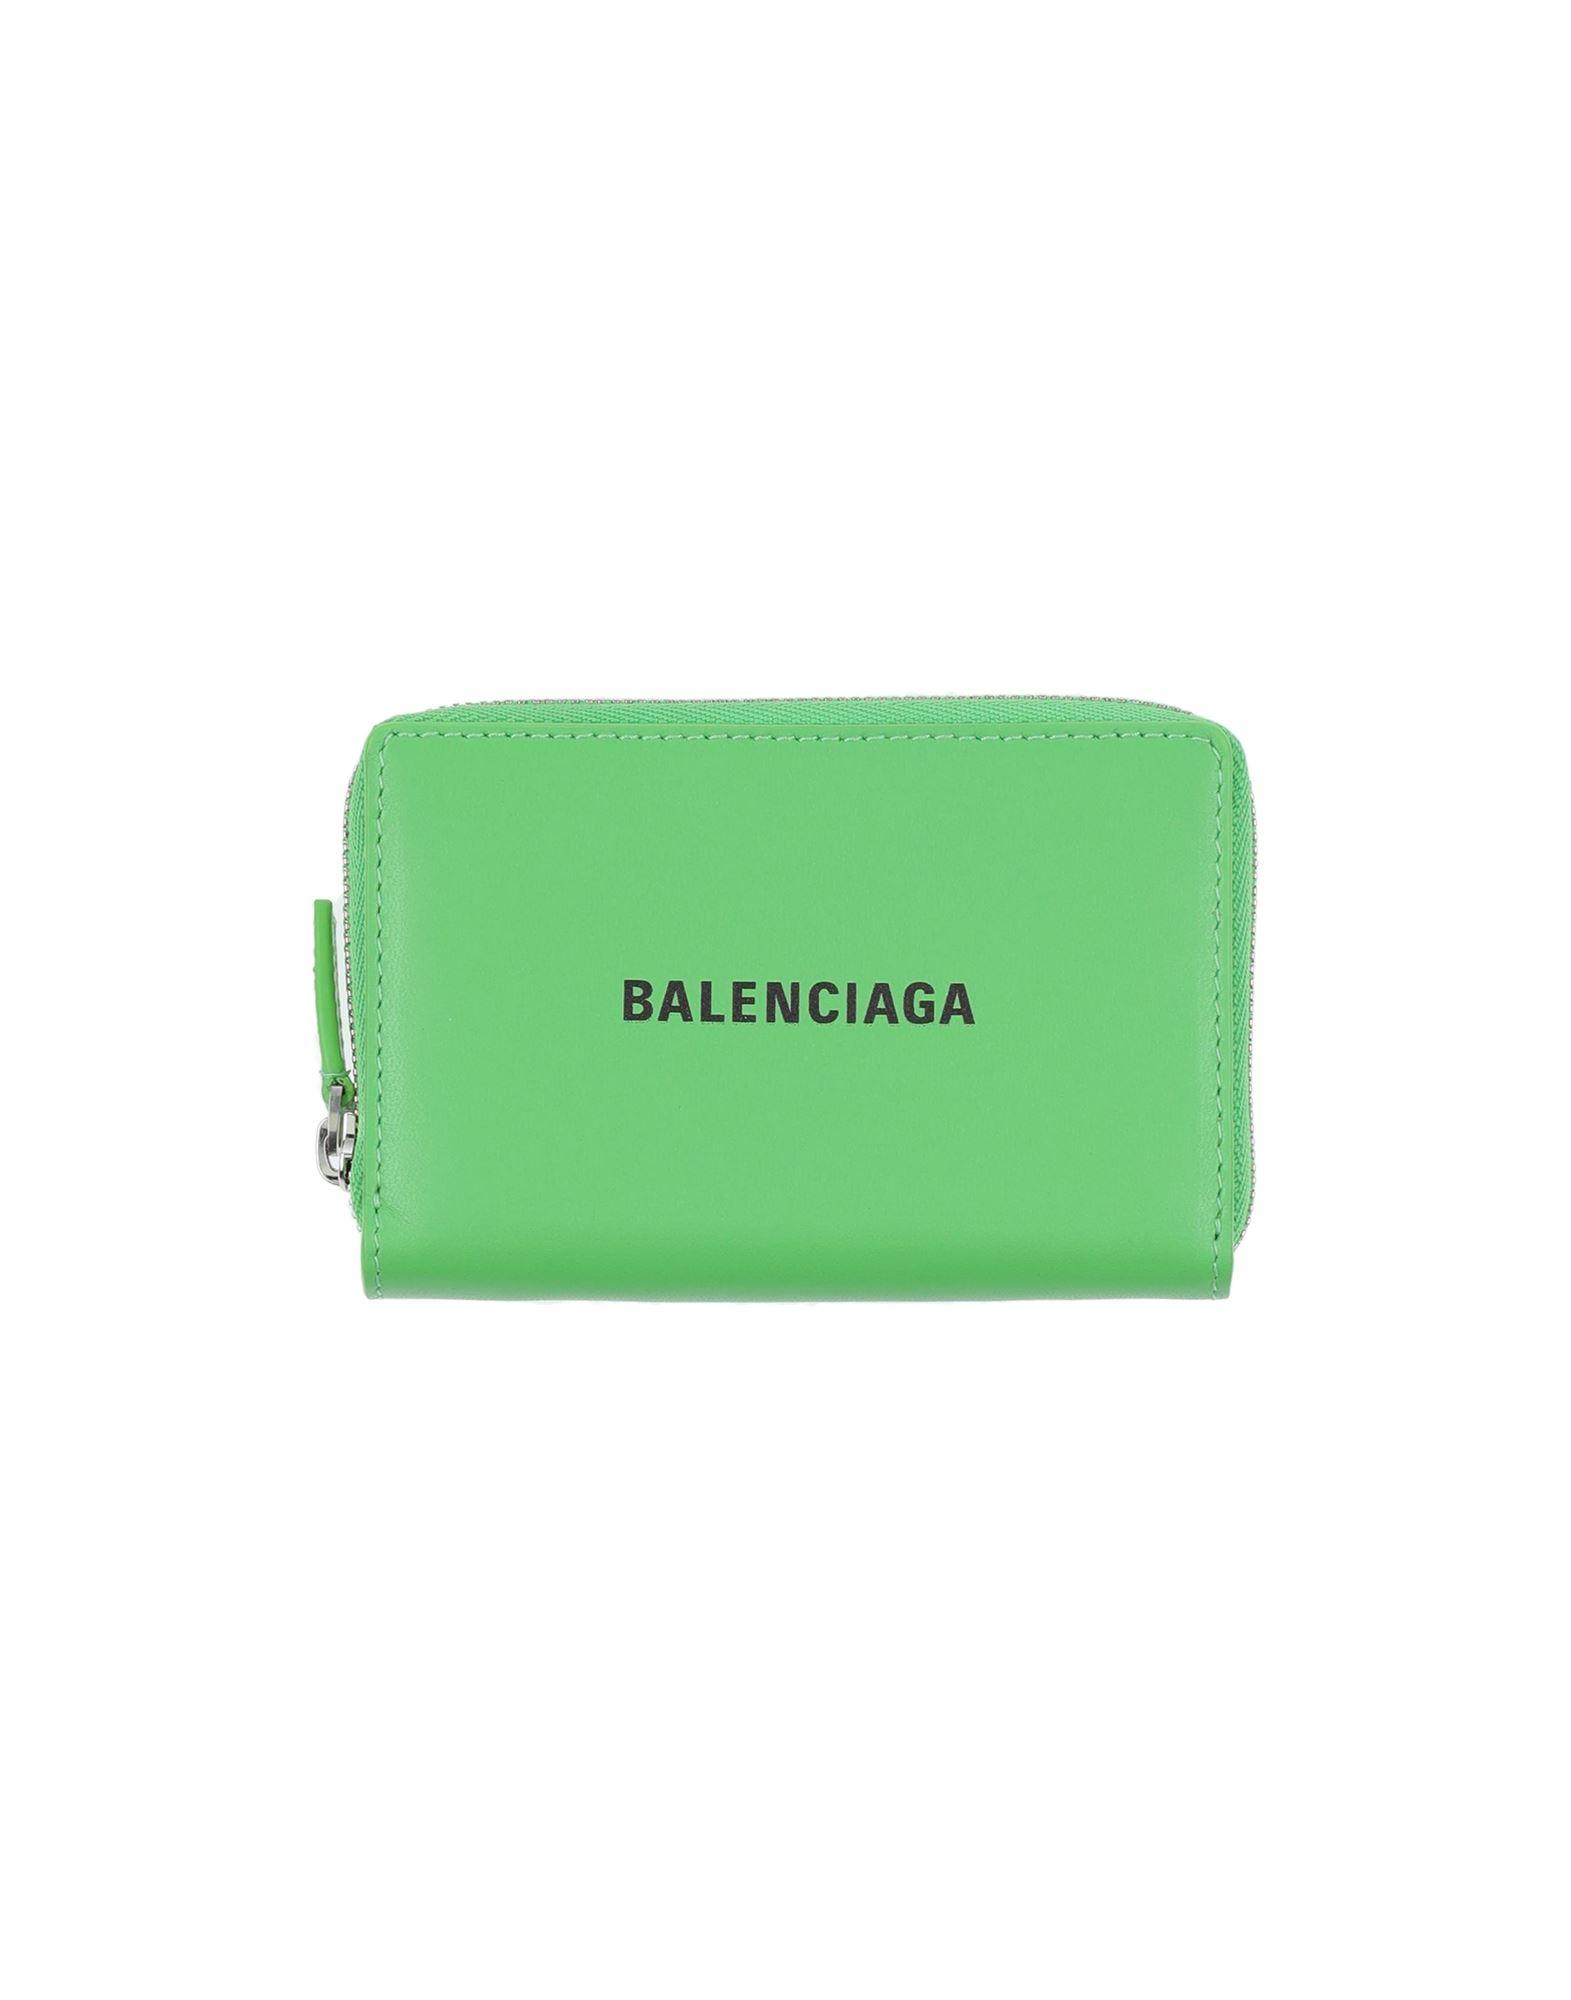 BALENCIAGA バレンシアガ メンズ 小銭入れ グリーン